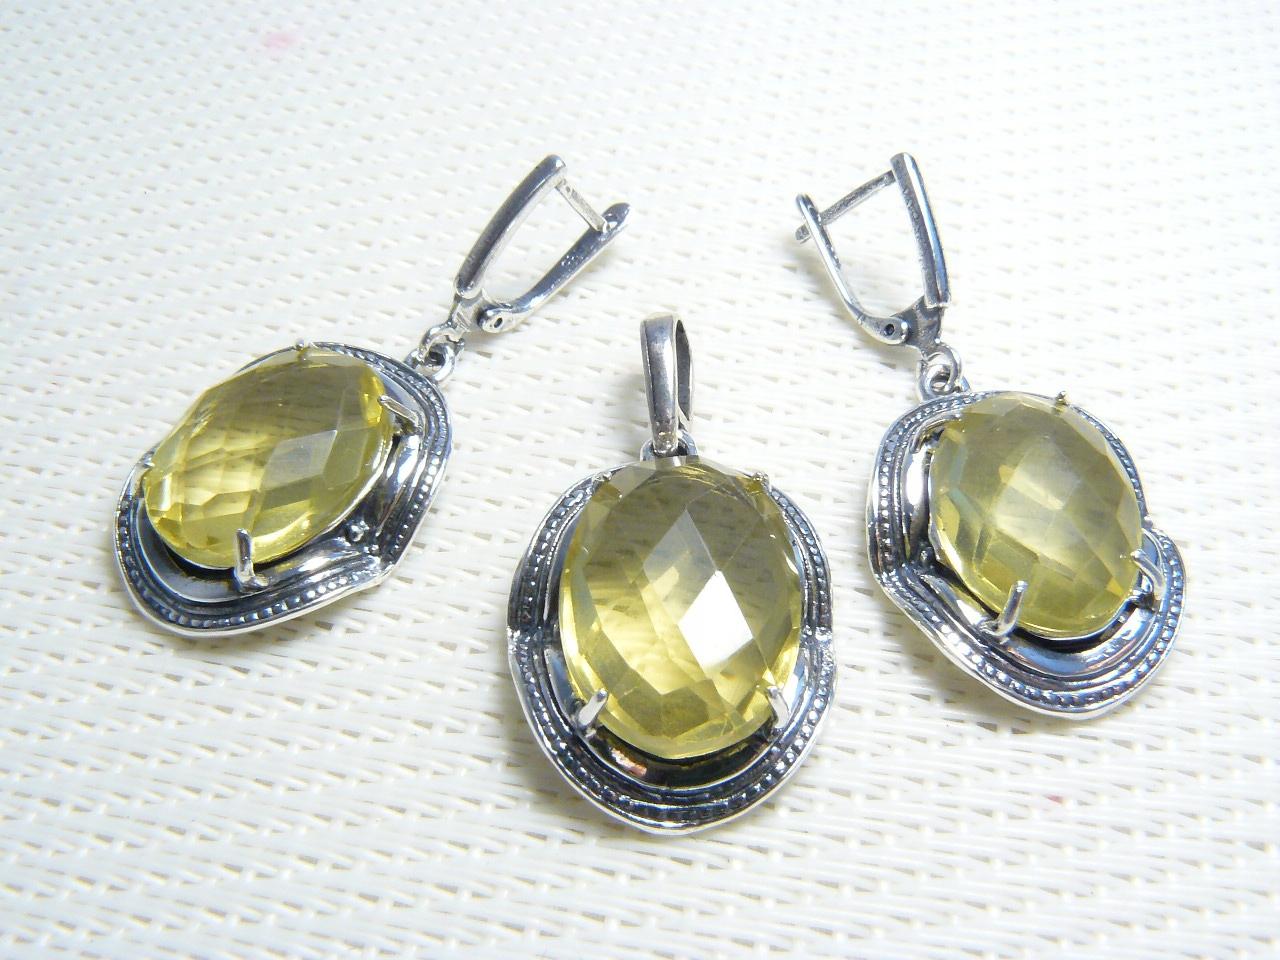 NATURALNY CYTRYN PIĘKNY KOMPLET srebro 925